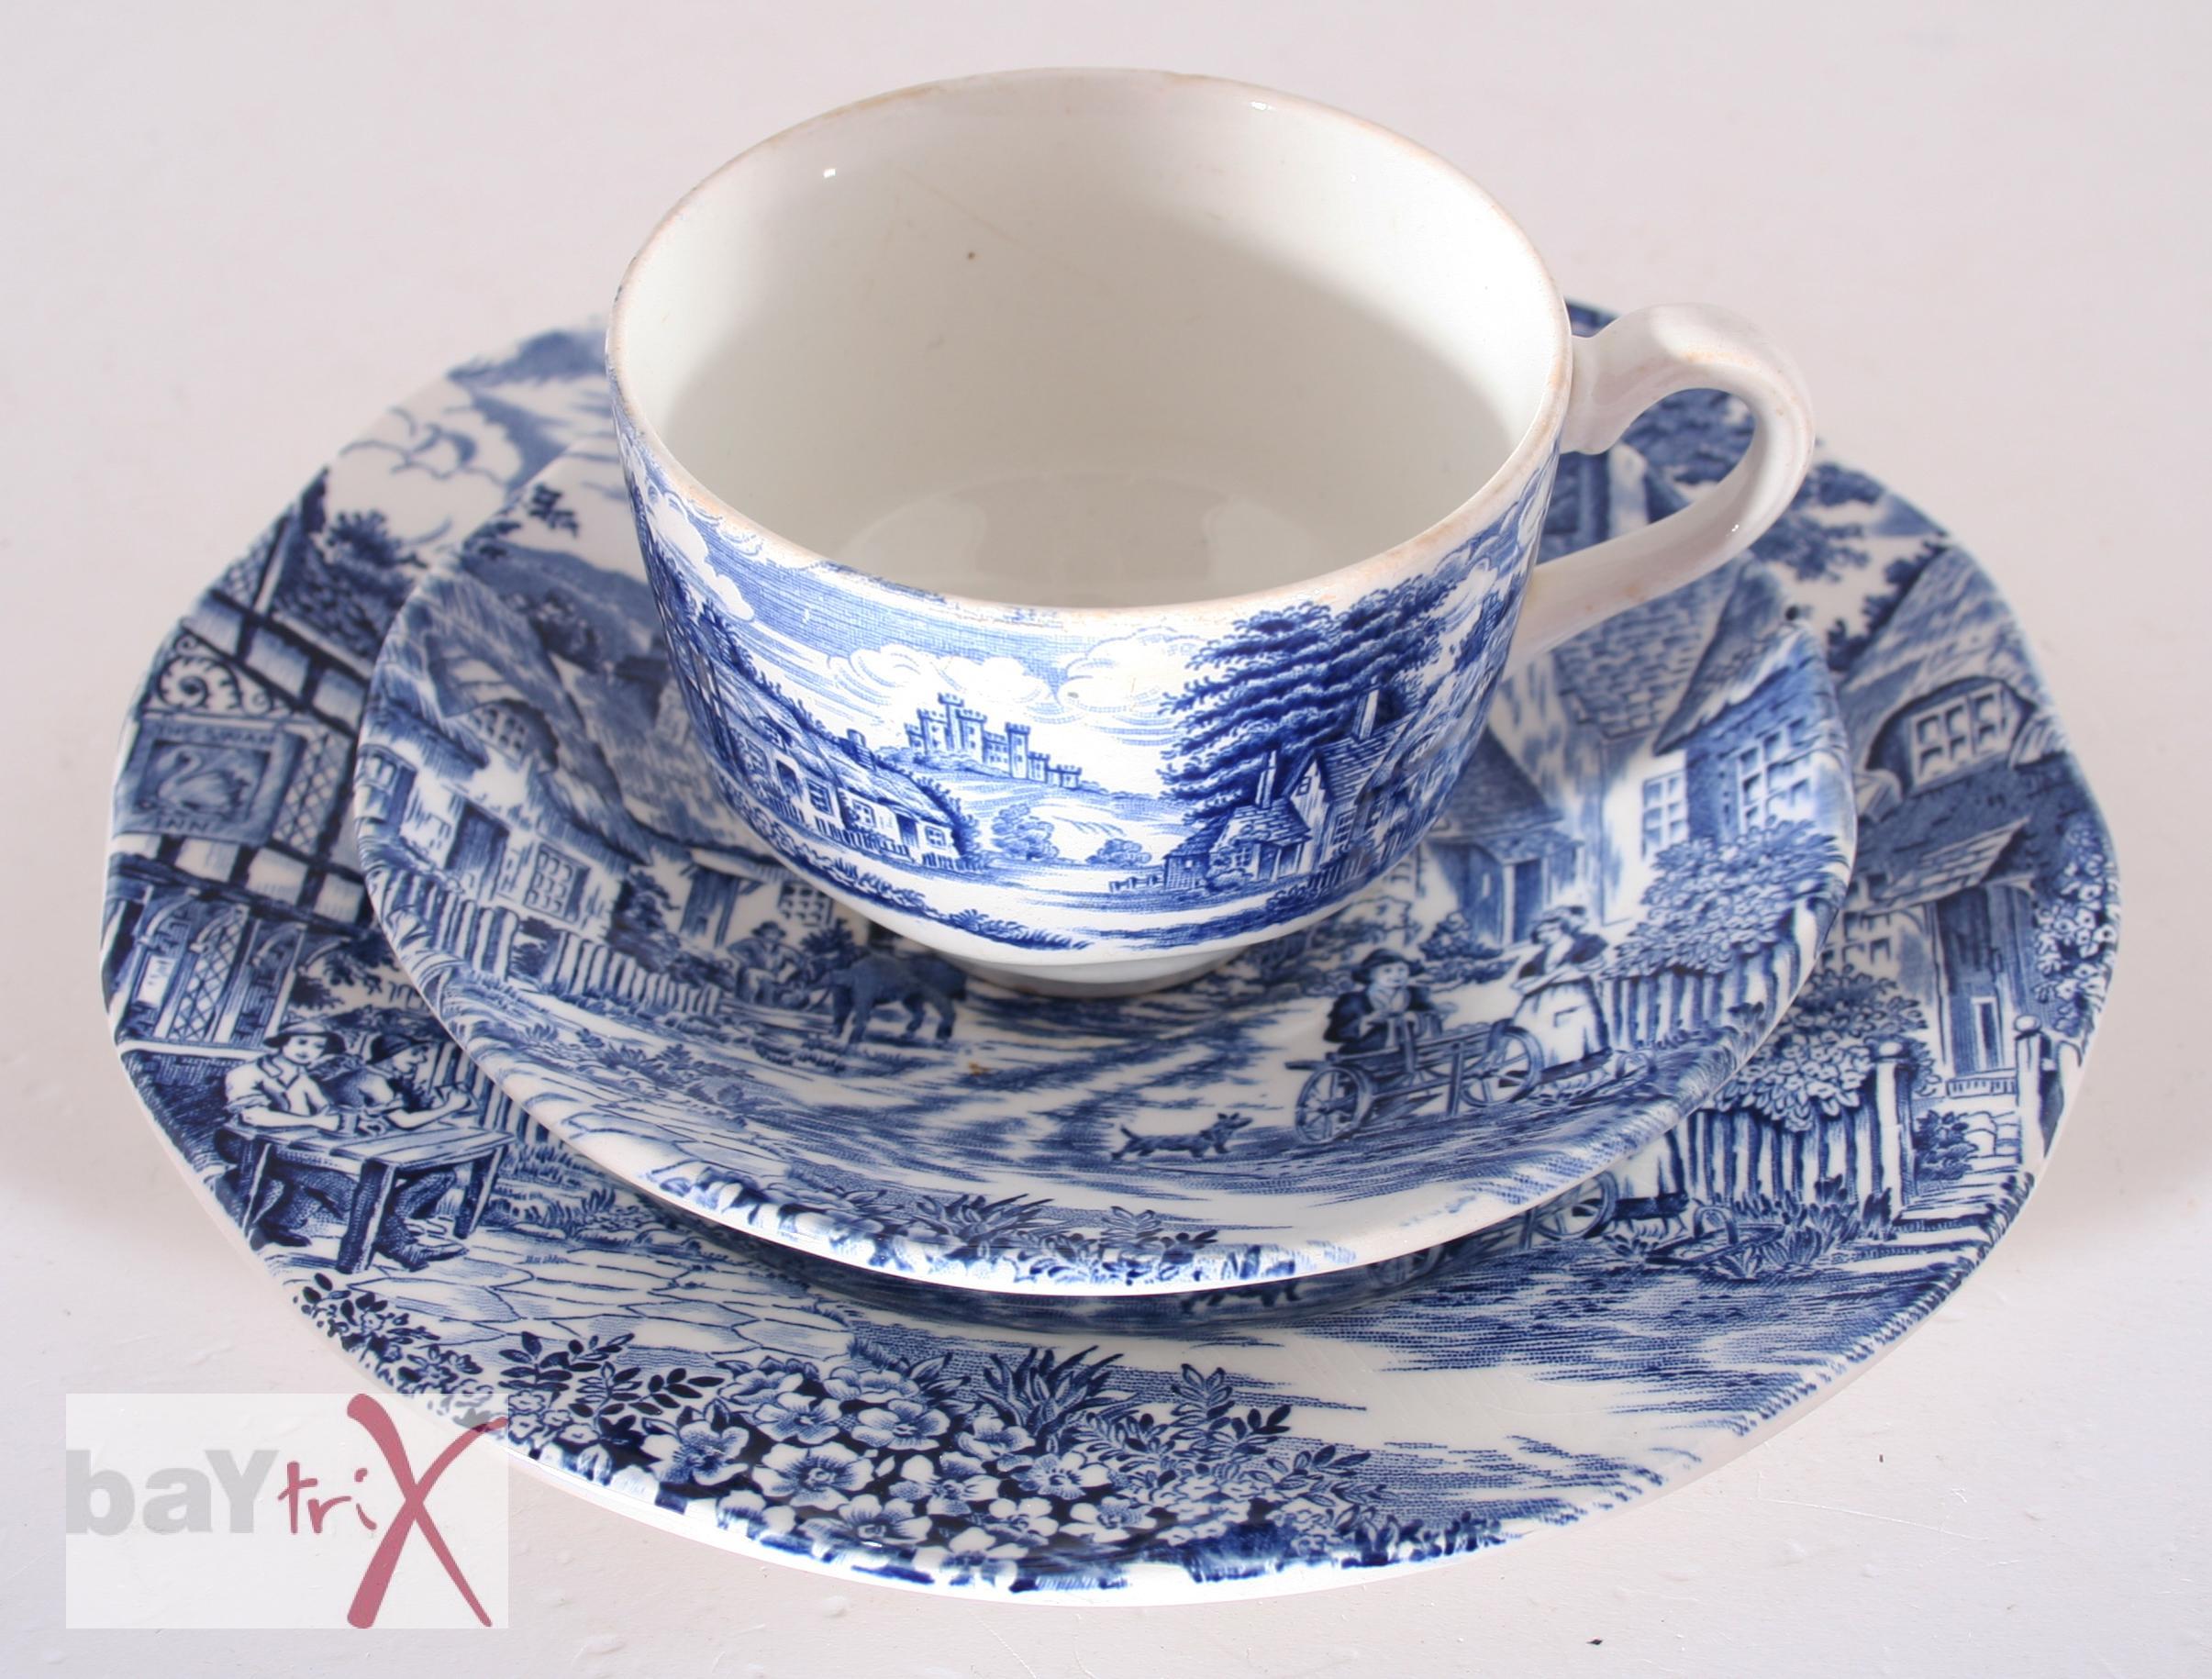 old english village gedeck tasse teller blau wei enoch wedgwood england kaffee ebay. Black Bedroom Furniture Sets. Home Design Ideas